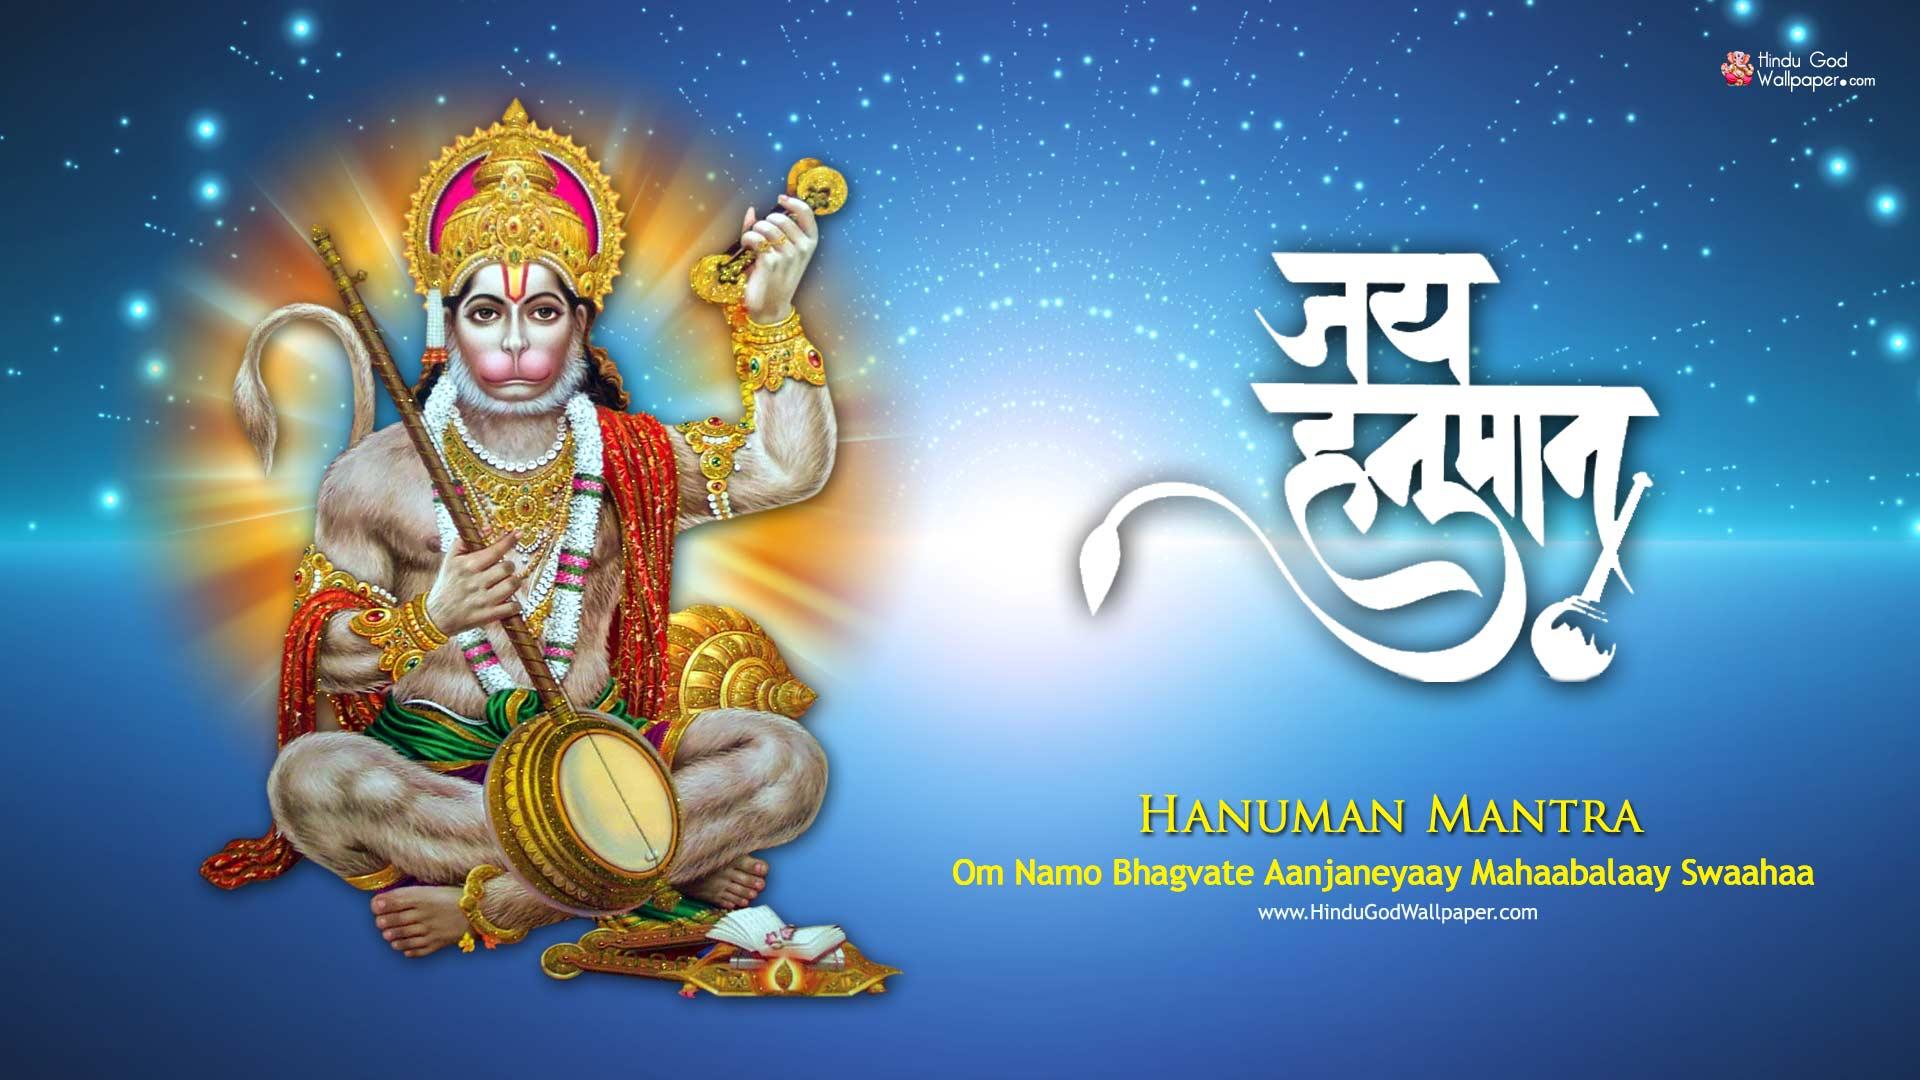 Hanuman 4K HD Wallpapers - Top Free Hanuman 4K HD ...